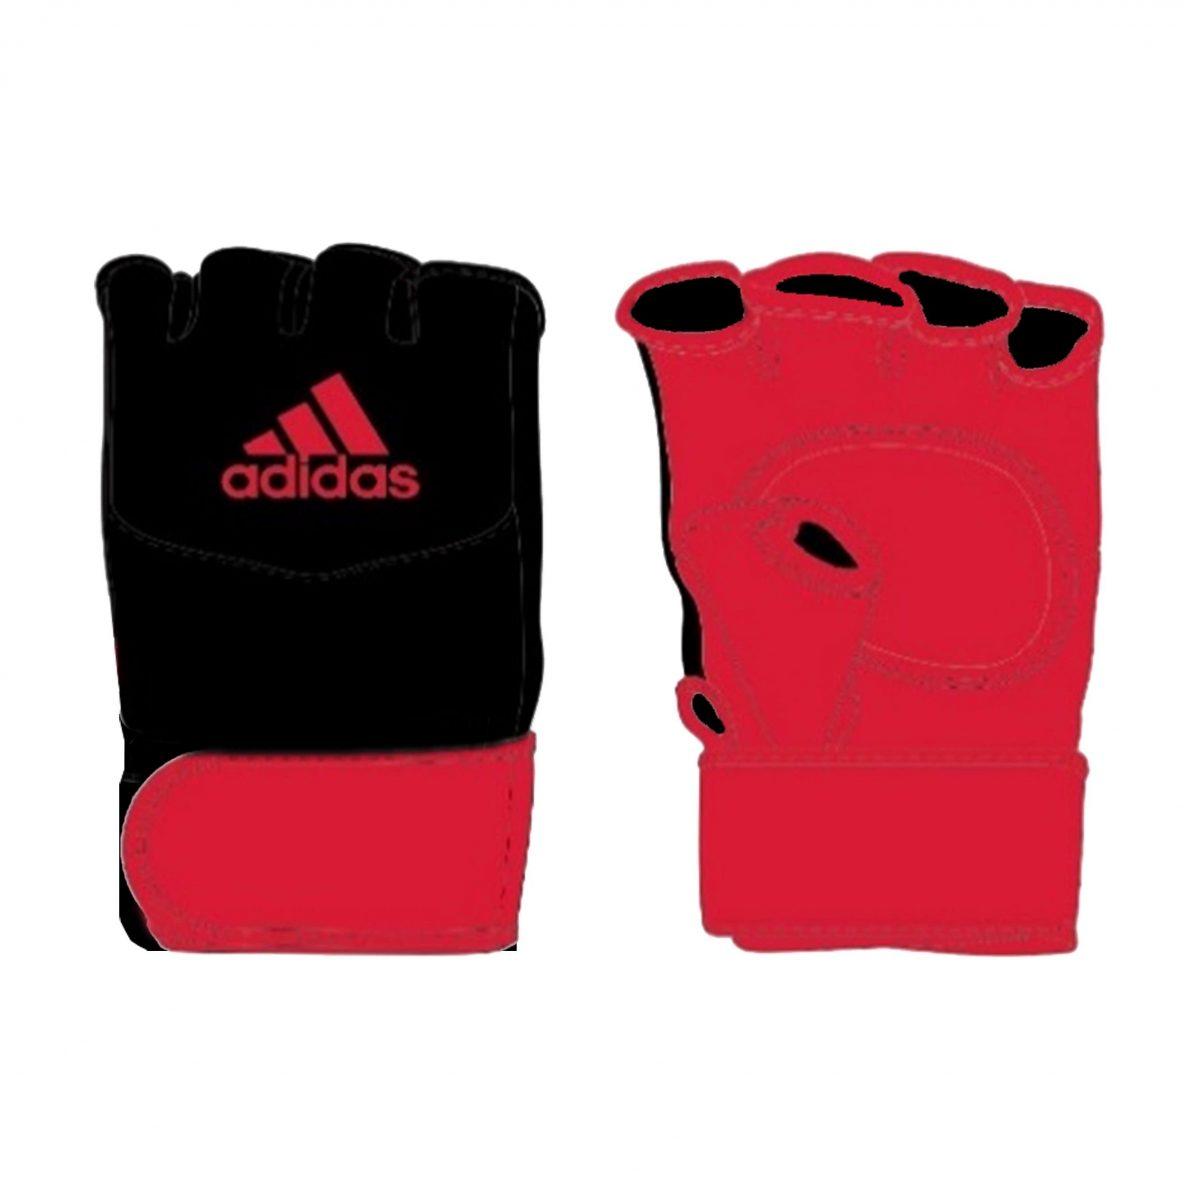 Adidas Traditional Grappling Handschuhe